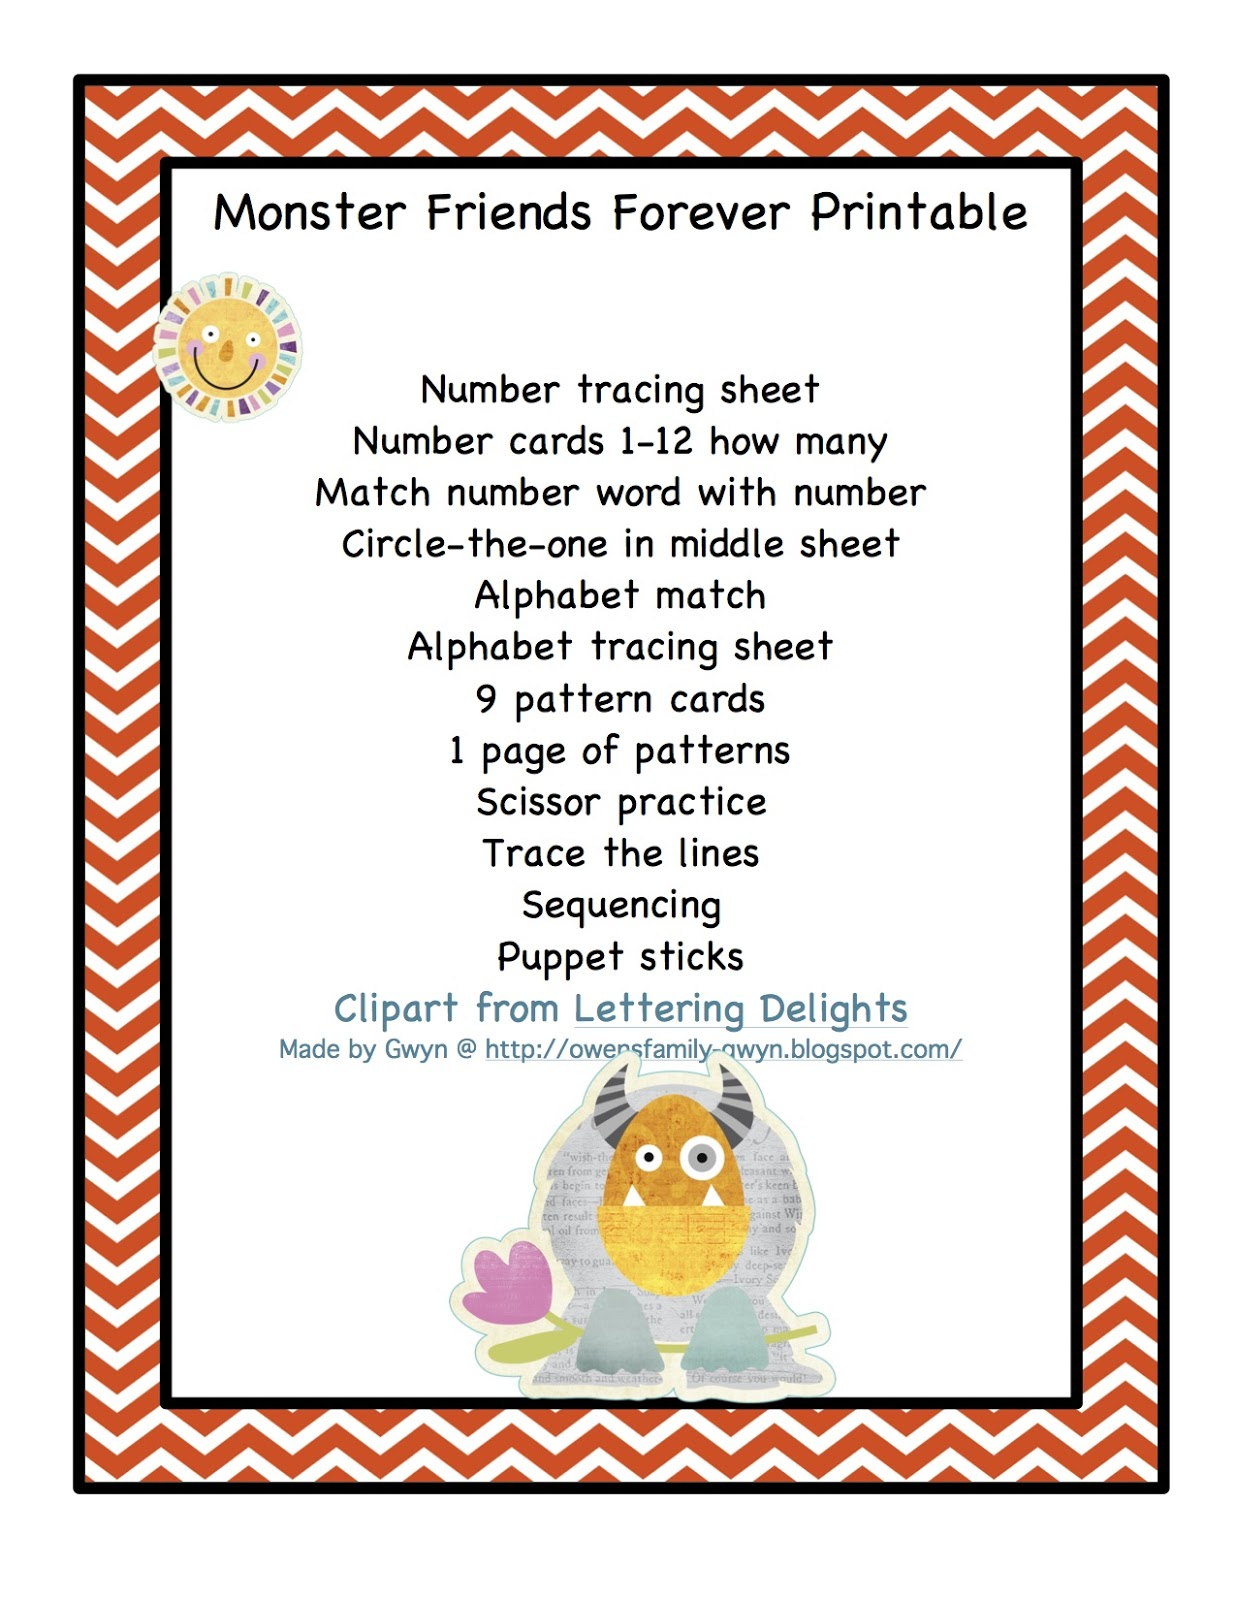 Monster Friends Forever Printable Preschool Printables